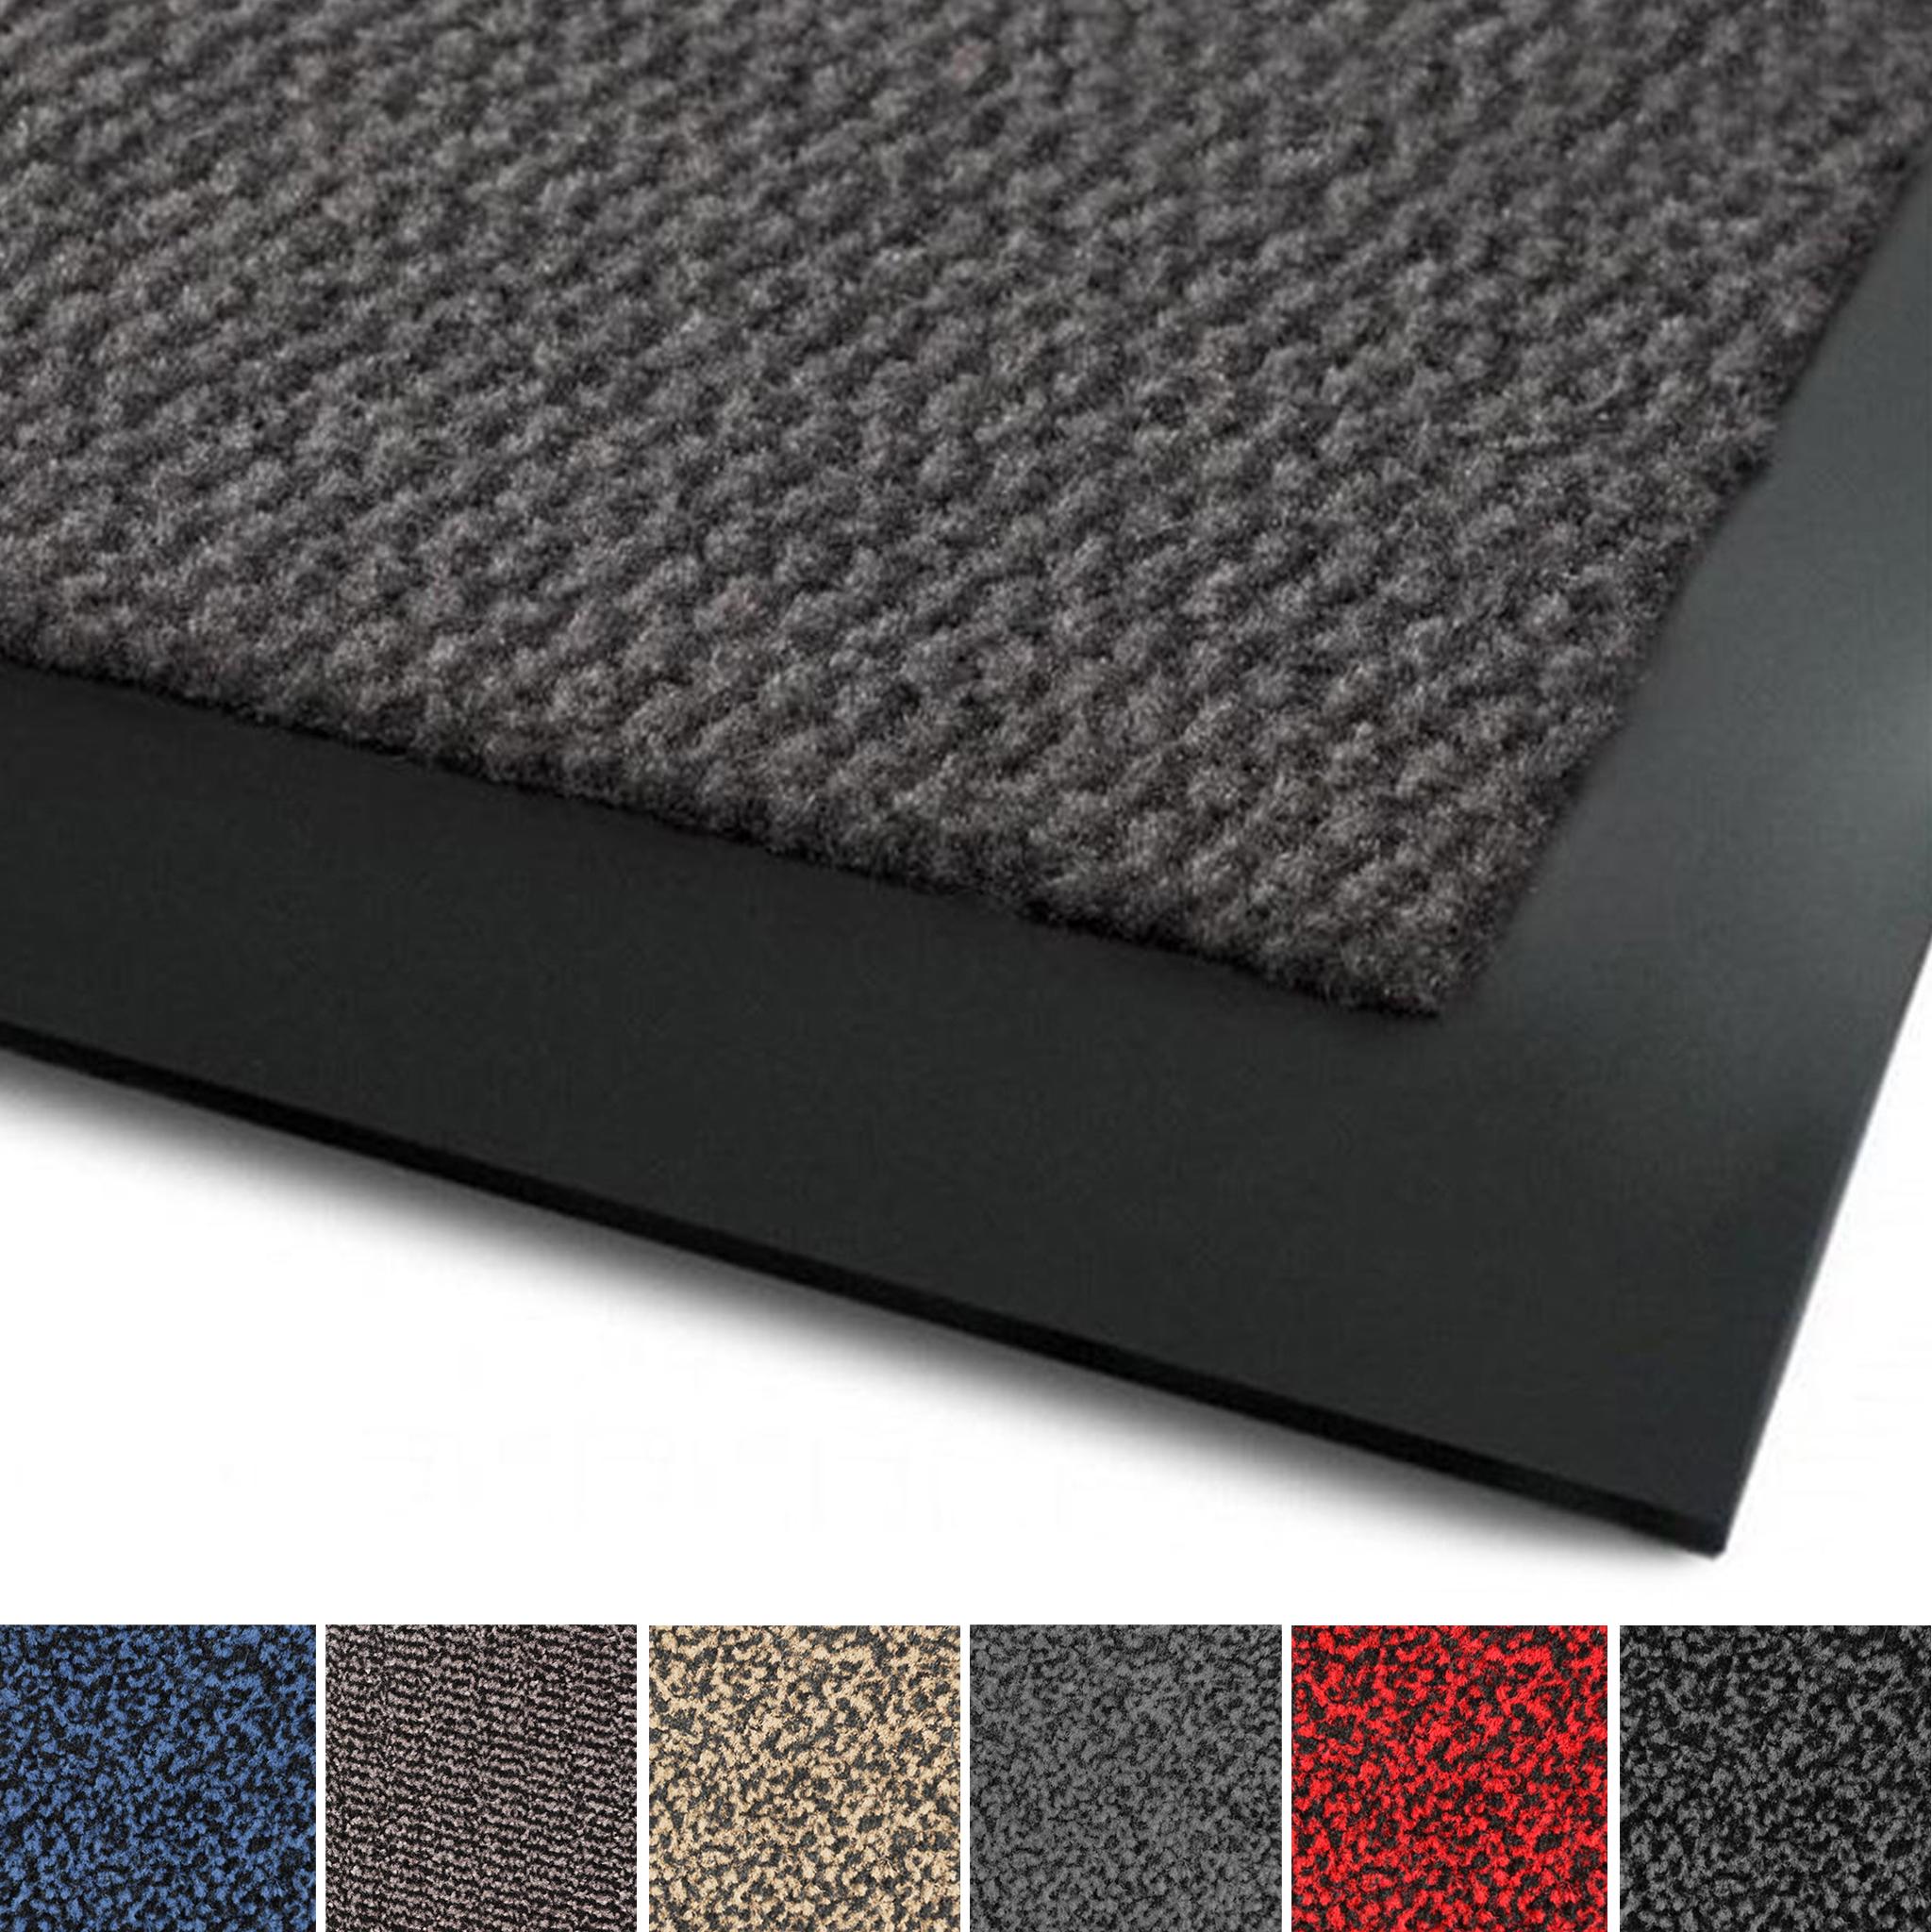 Dirt-trapping mat SKY 60x90cm